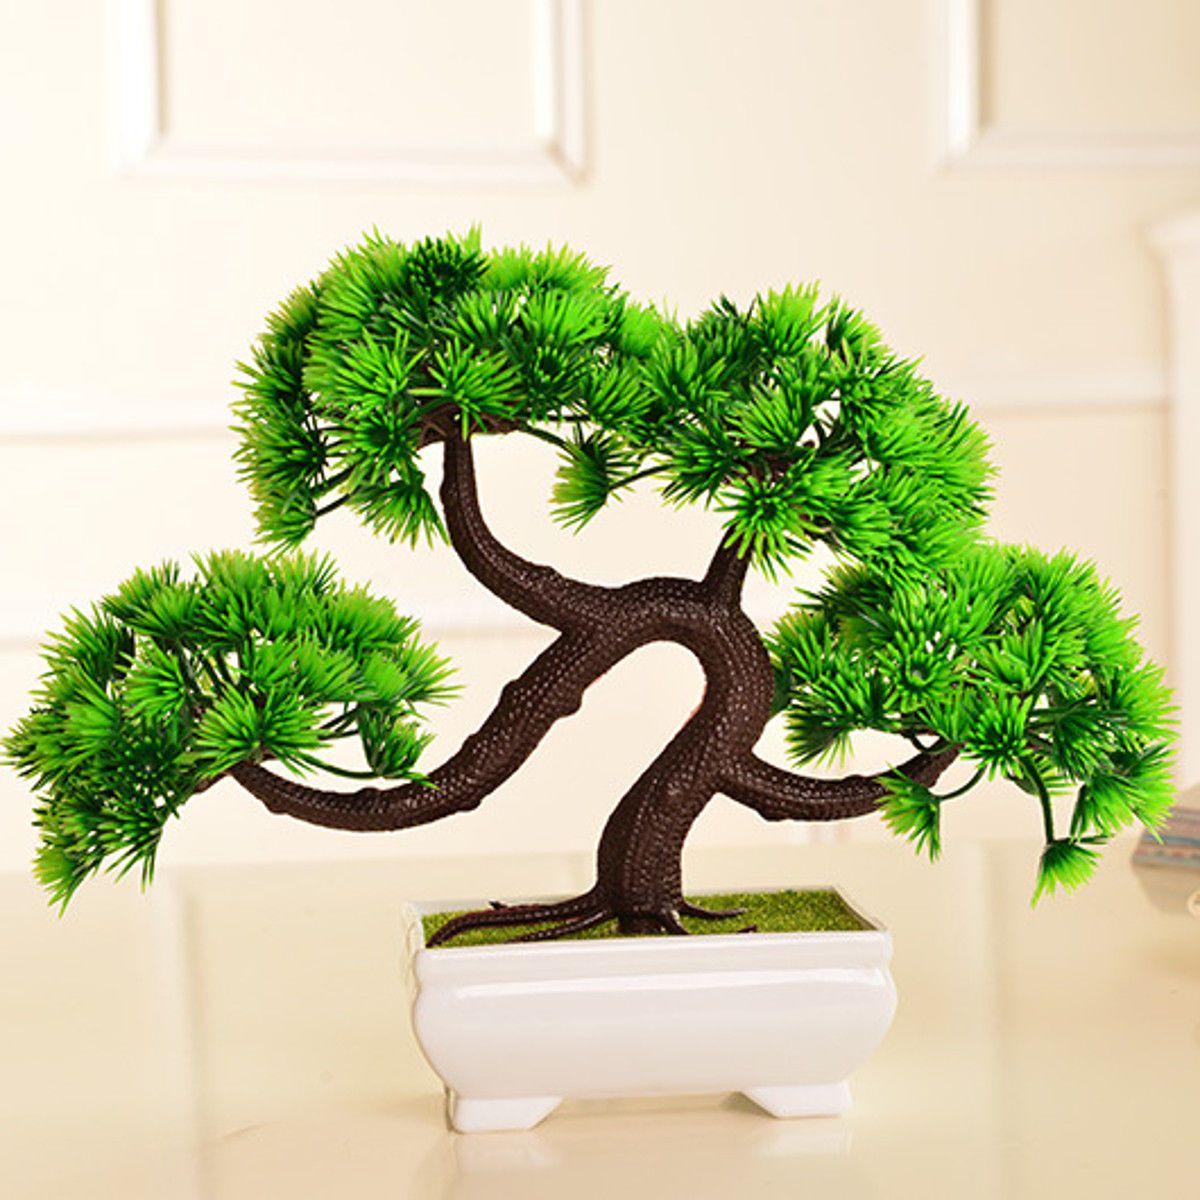 In home garden ideas  Bonsai Tree in Pot Artificial Plant for Home Garden Office Plant